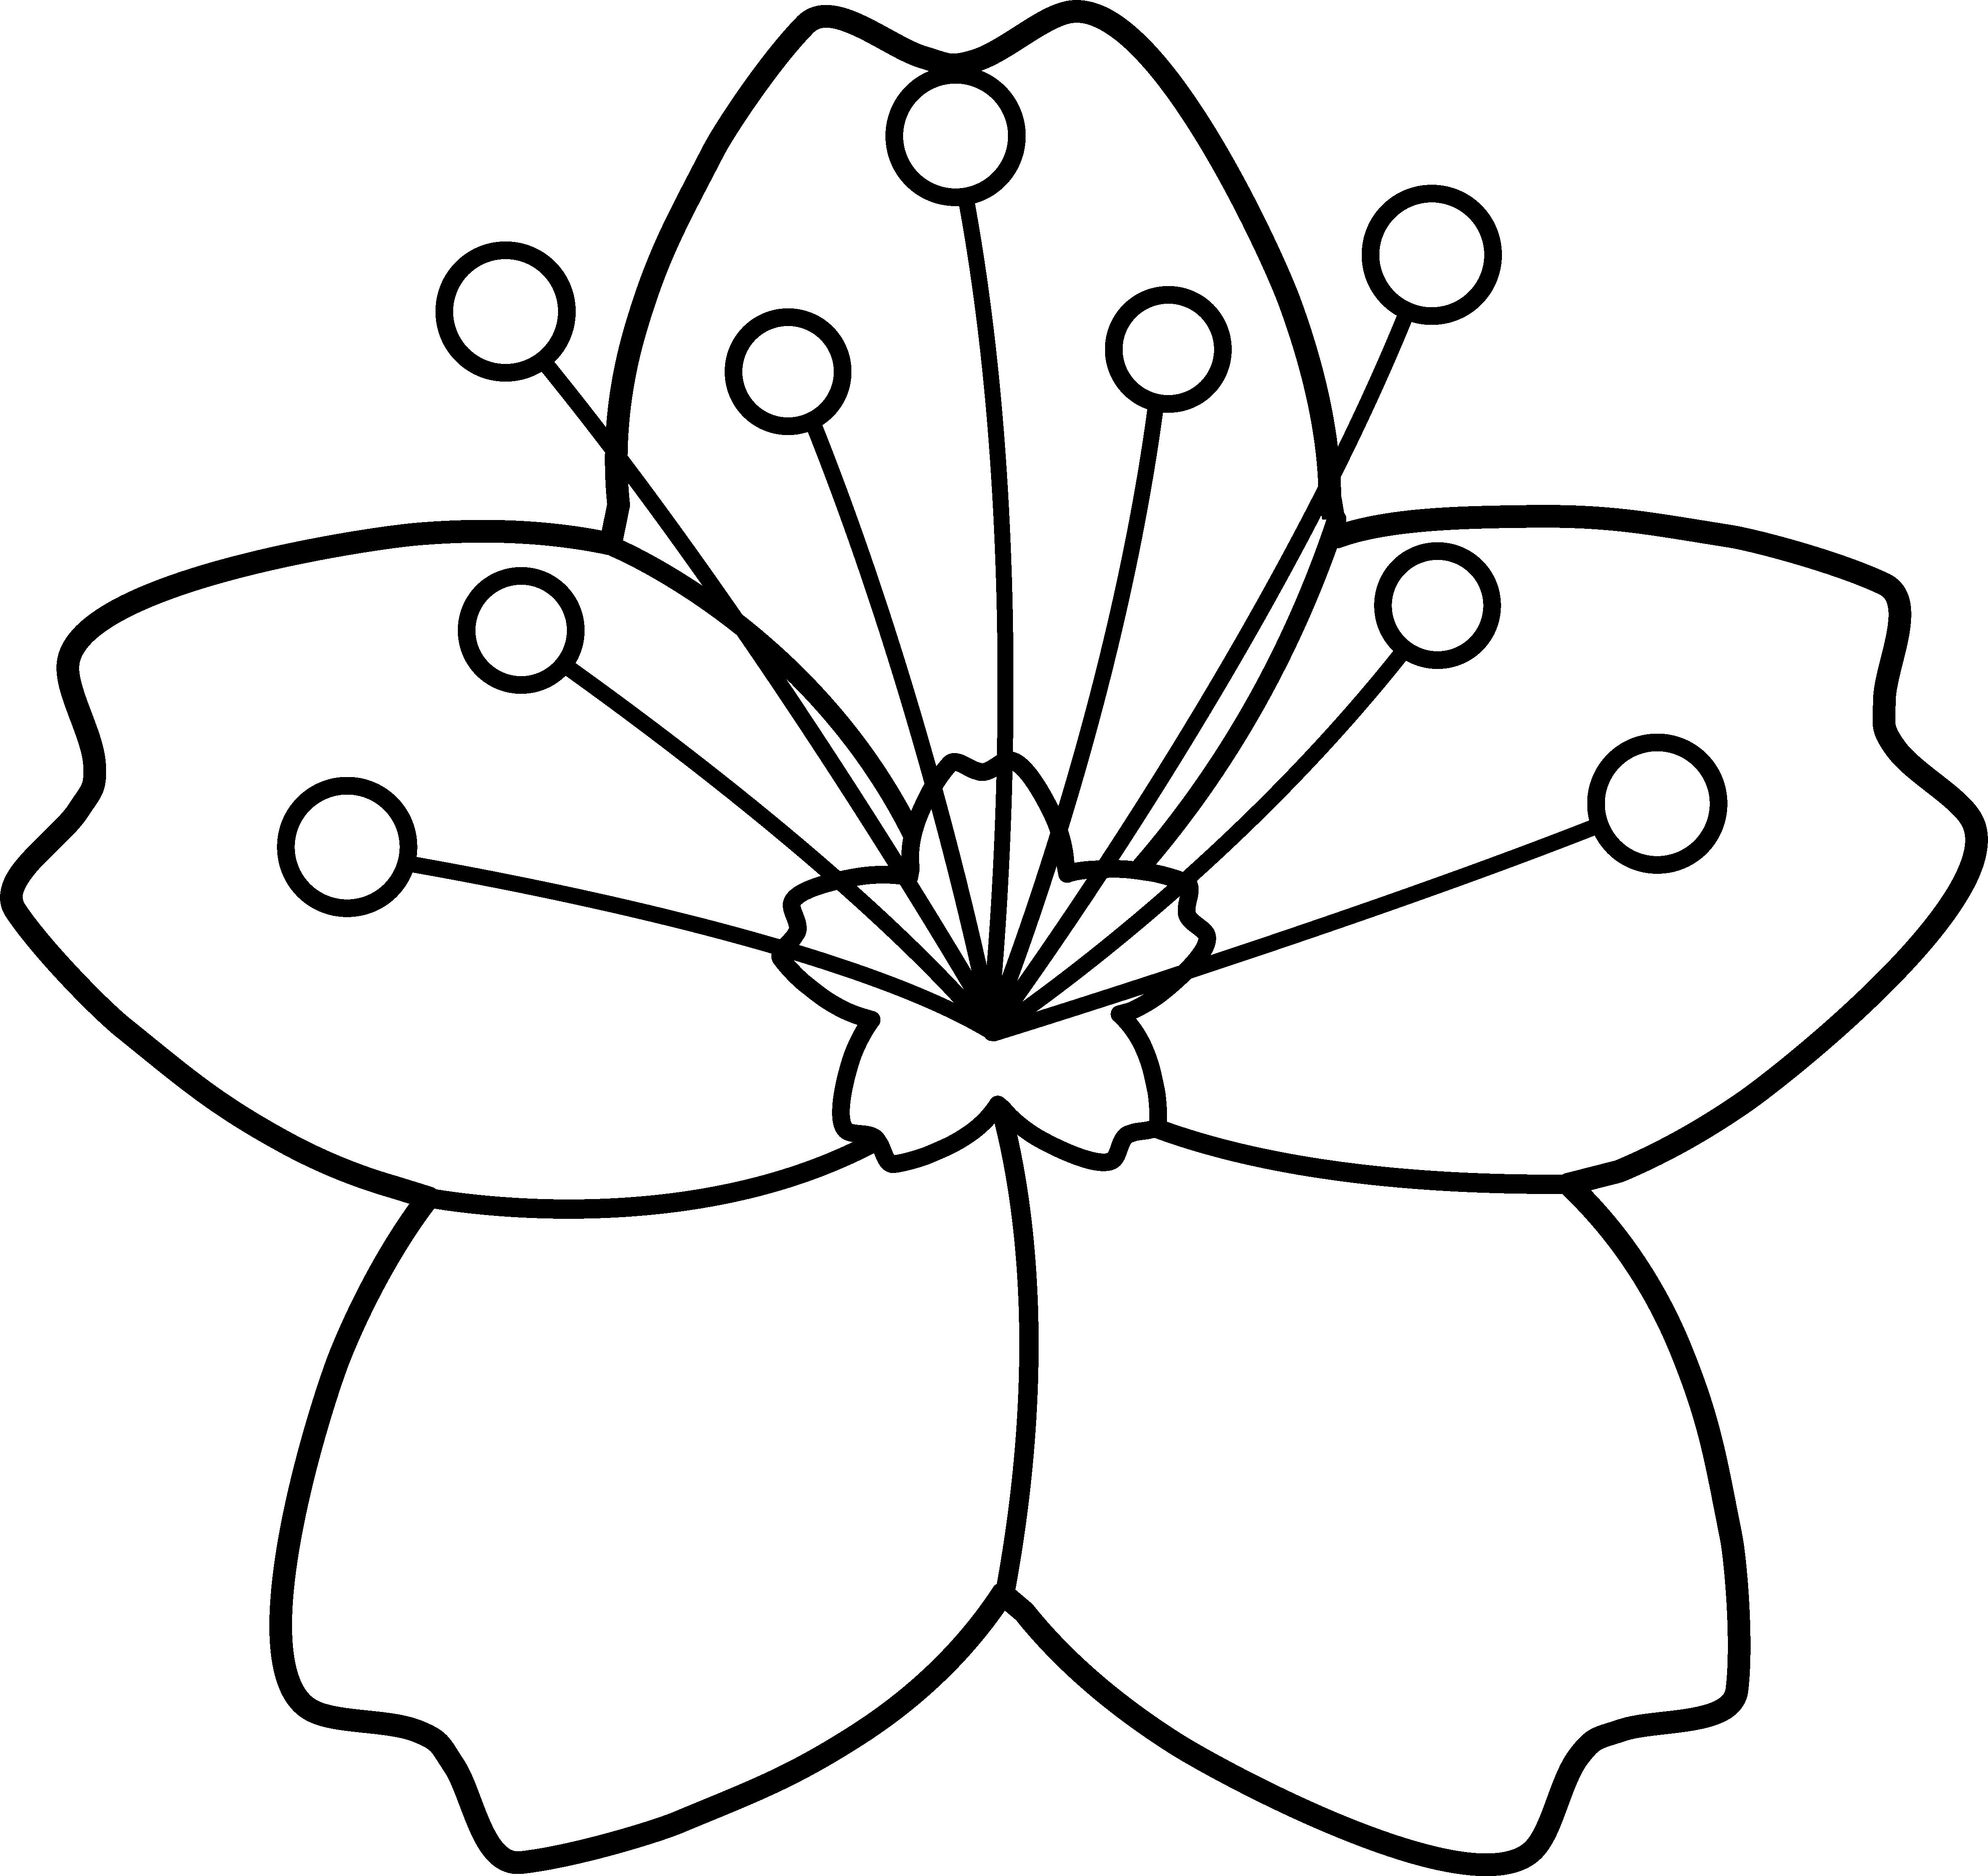 4724x4459 Cherry Blossom Line Art Embroidery Cherry Blossoms